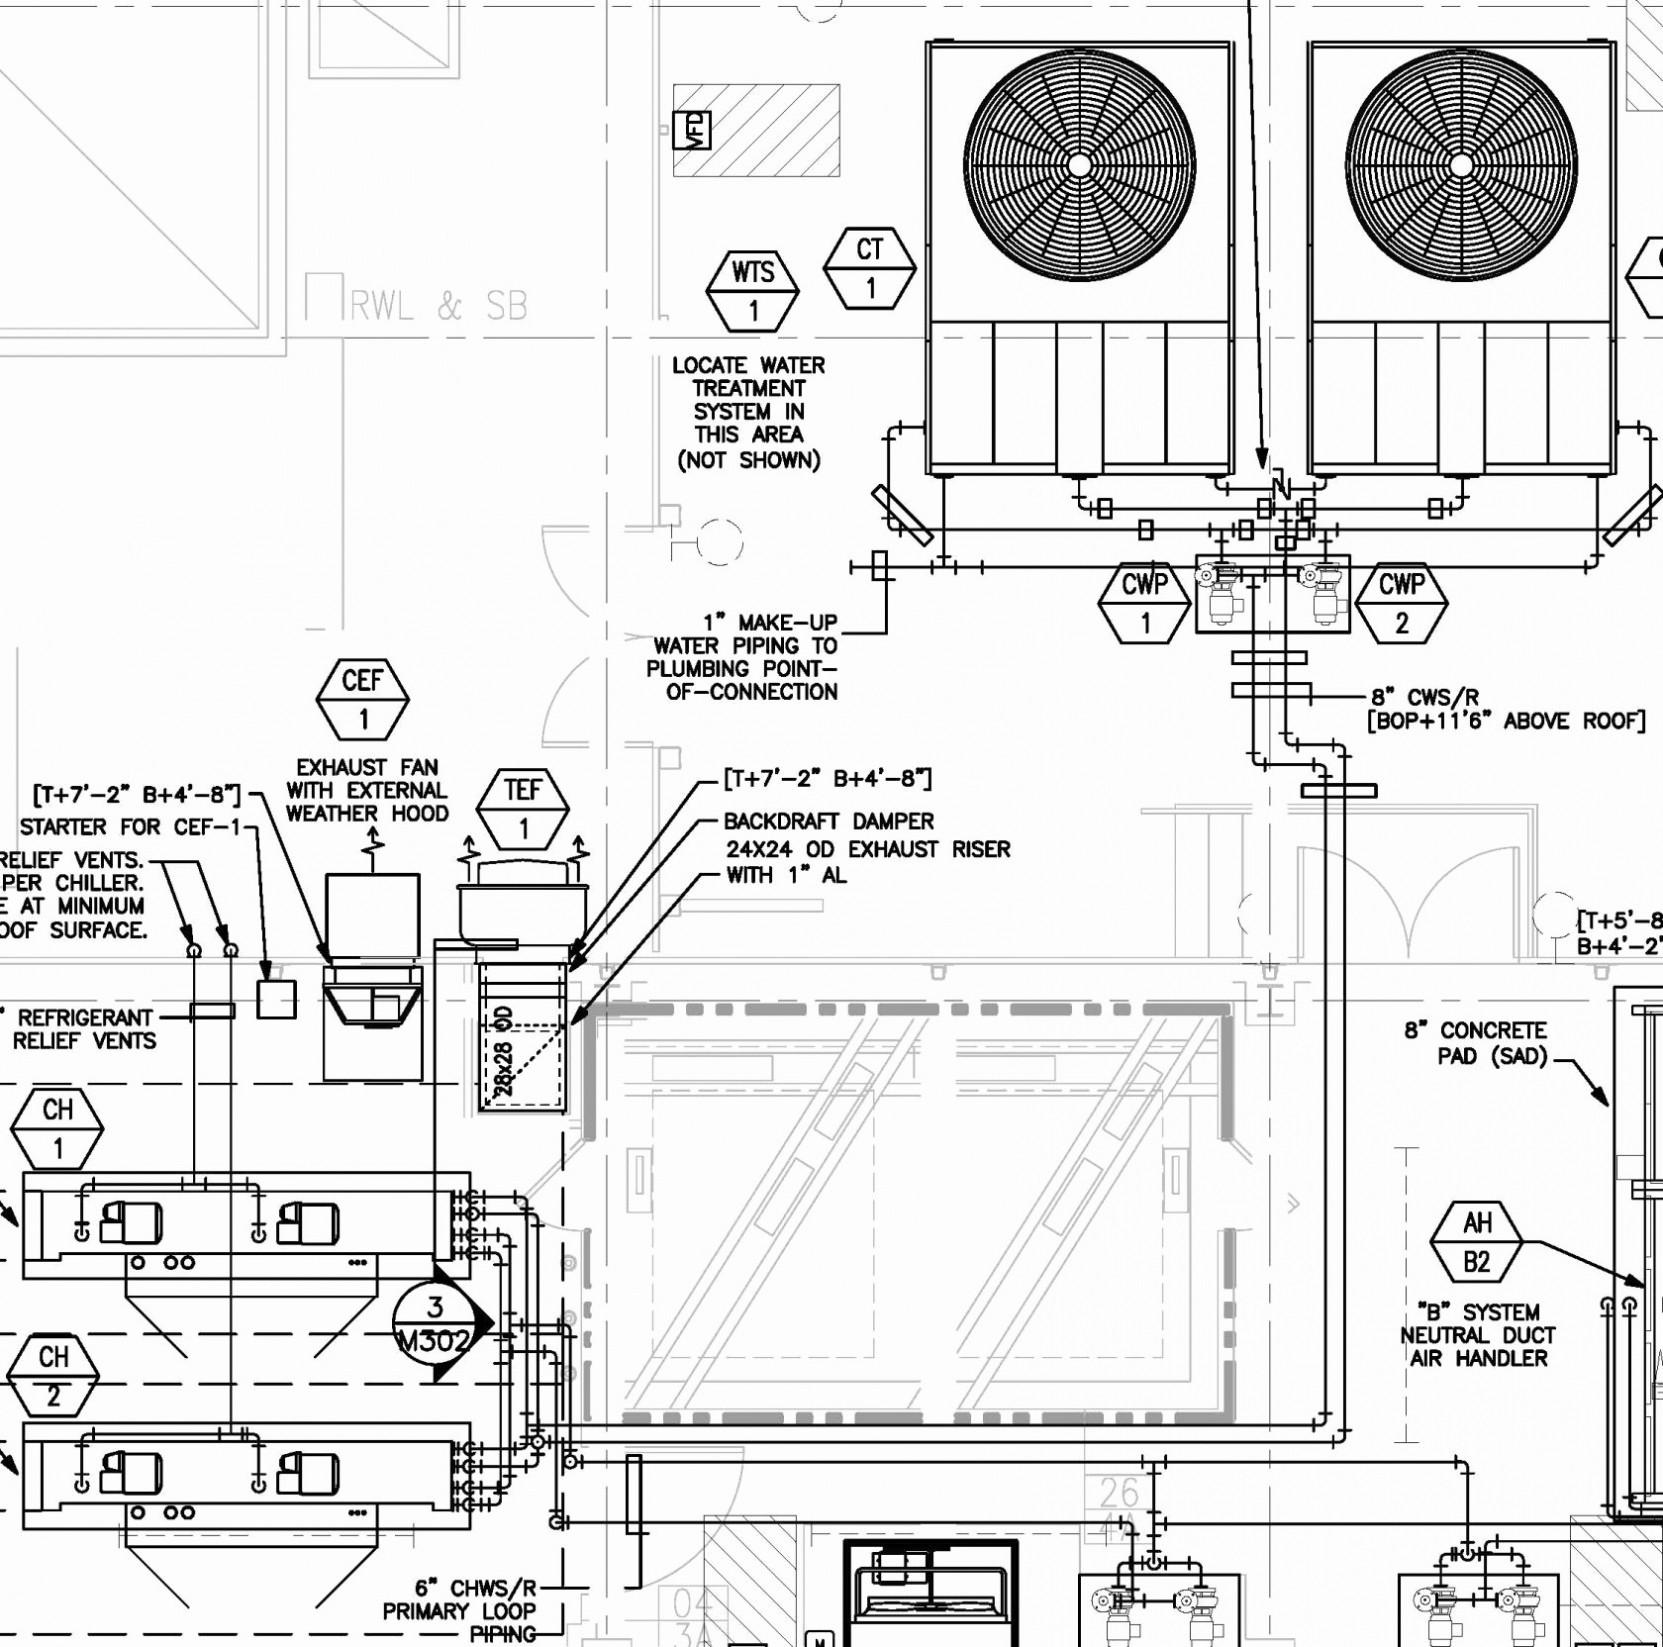 stx38 wiring diagram black deck easy animal cell l130 john deere riding lawn mower switch diagrams